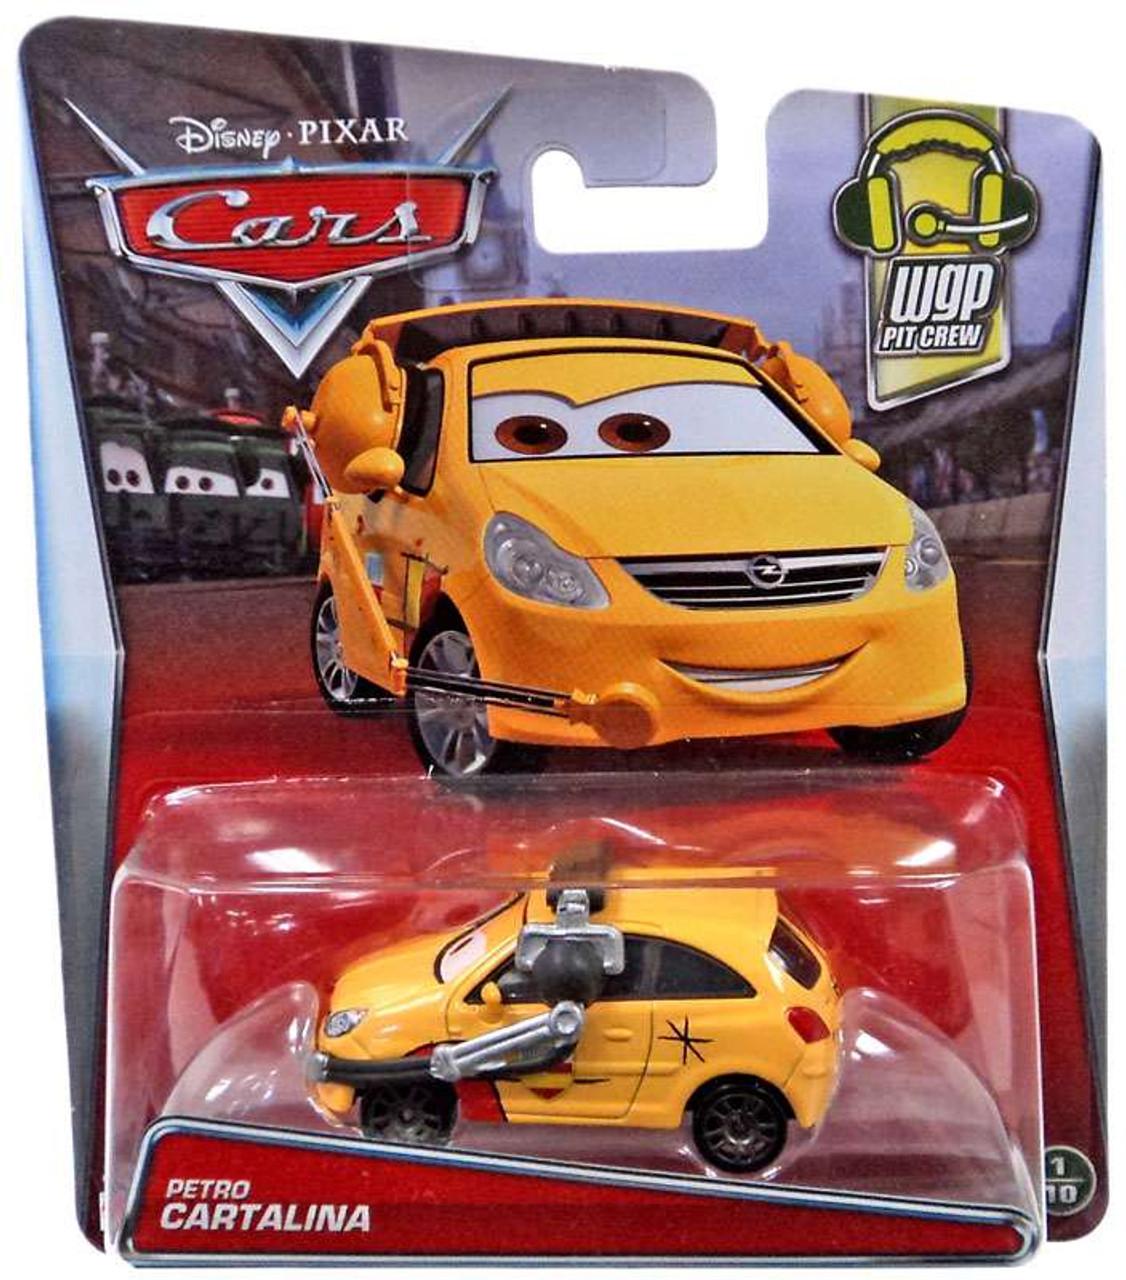 Disney Cars WGP Pit Crew Petro Cartalina 155 Diecast Car